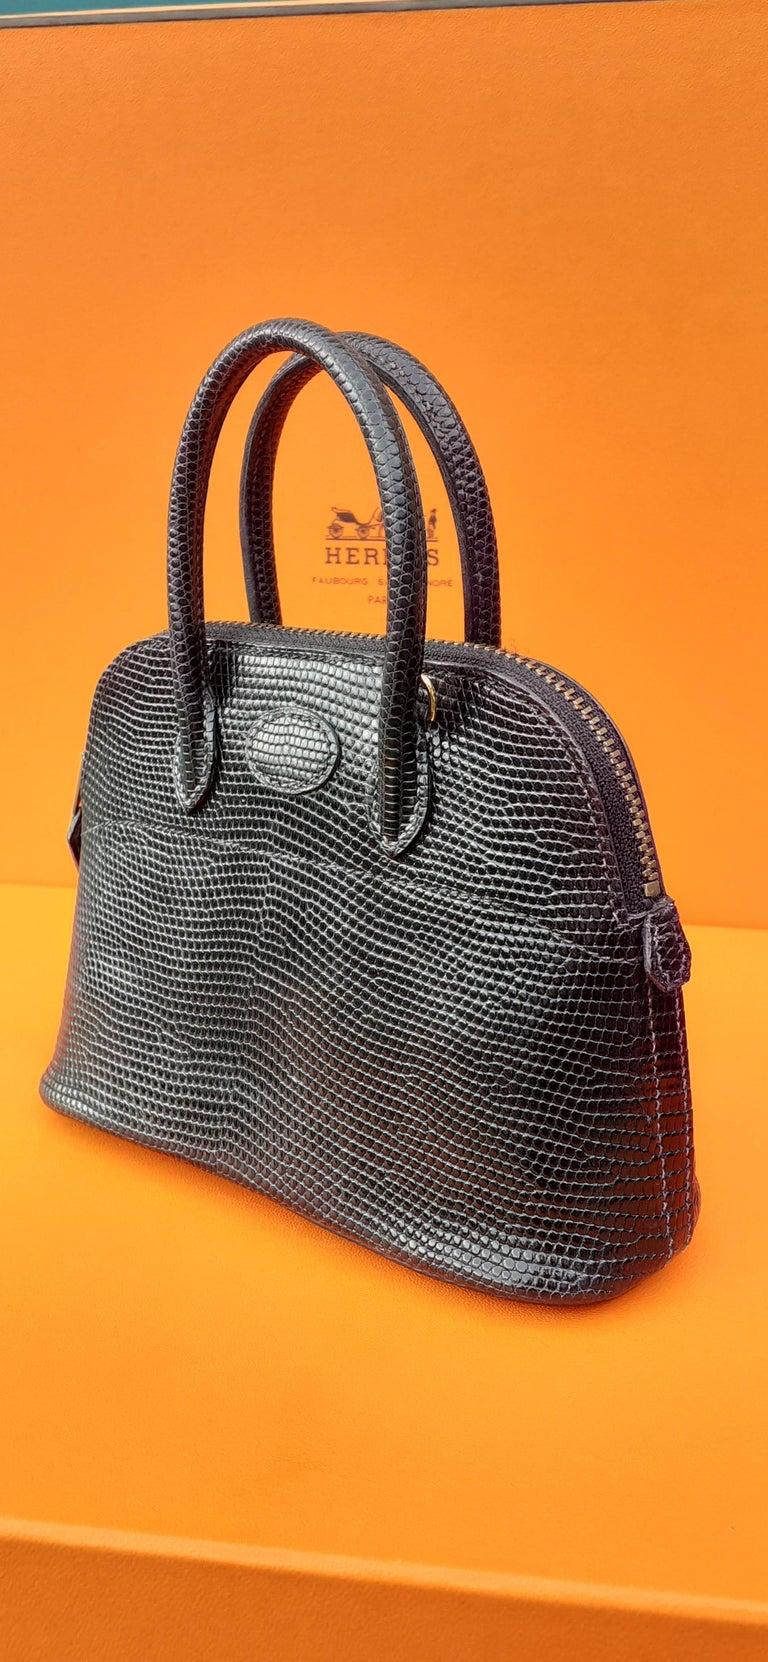 Exceptional Hermès Micro Bolide Bag Black Lizard Golden Hdw 16 cm RARE For Sale 2